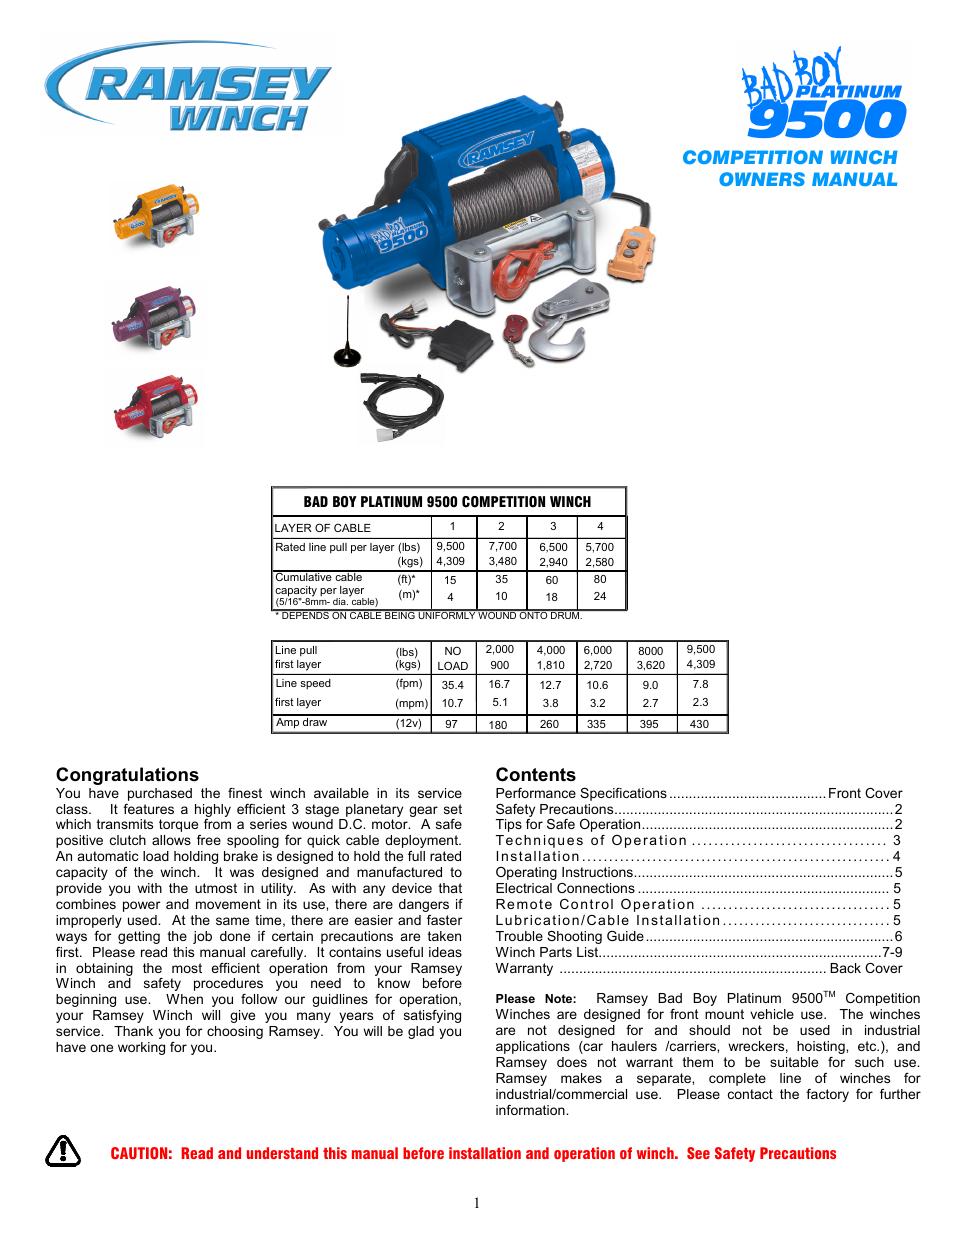 ramsey winch plat 9500 bad boy user manual 12 pages rh manualsdir com